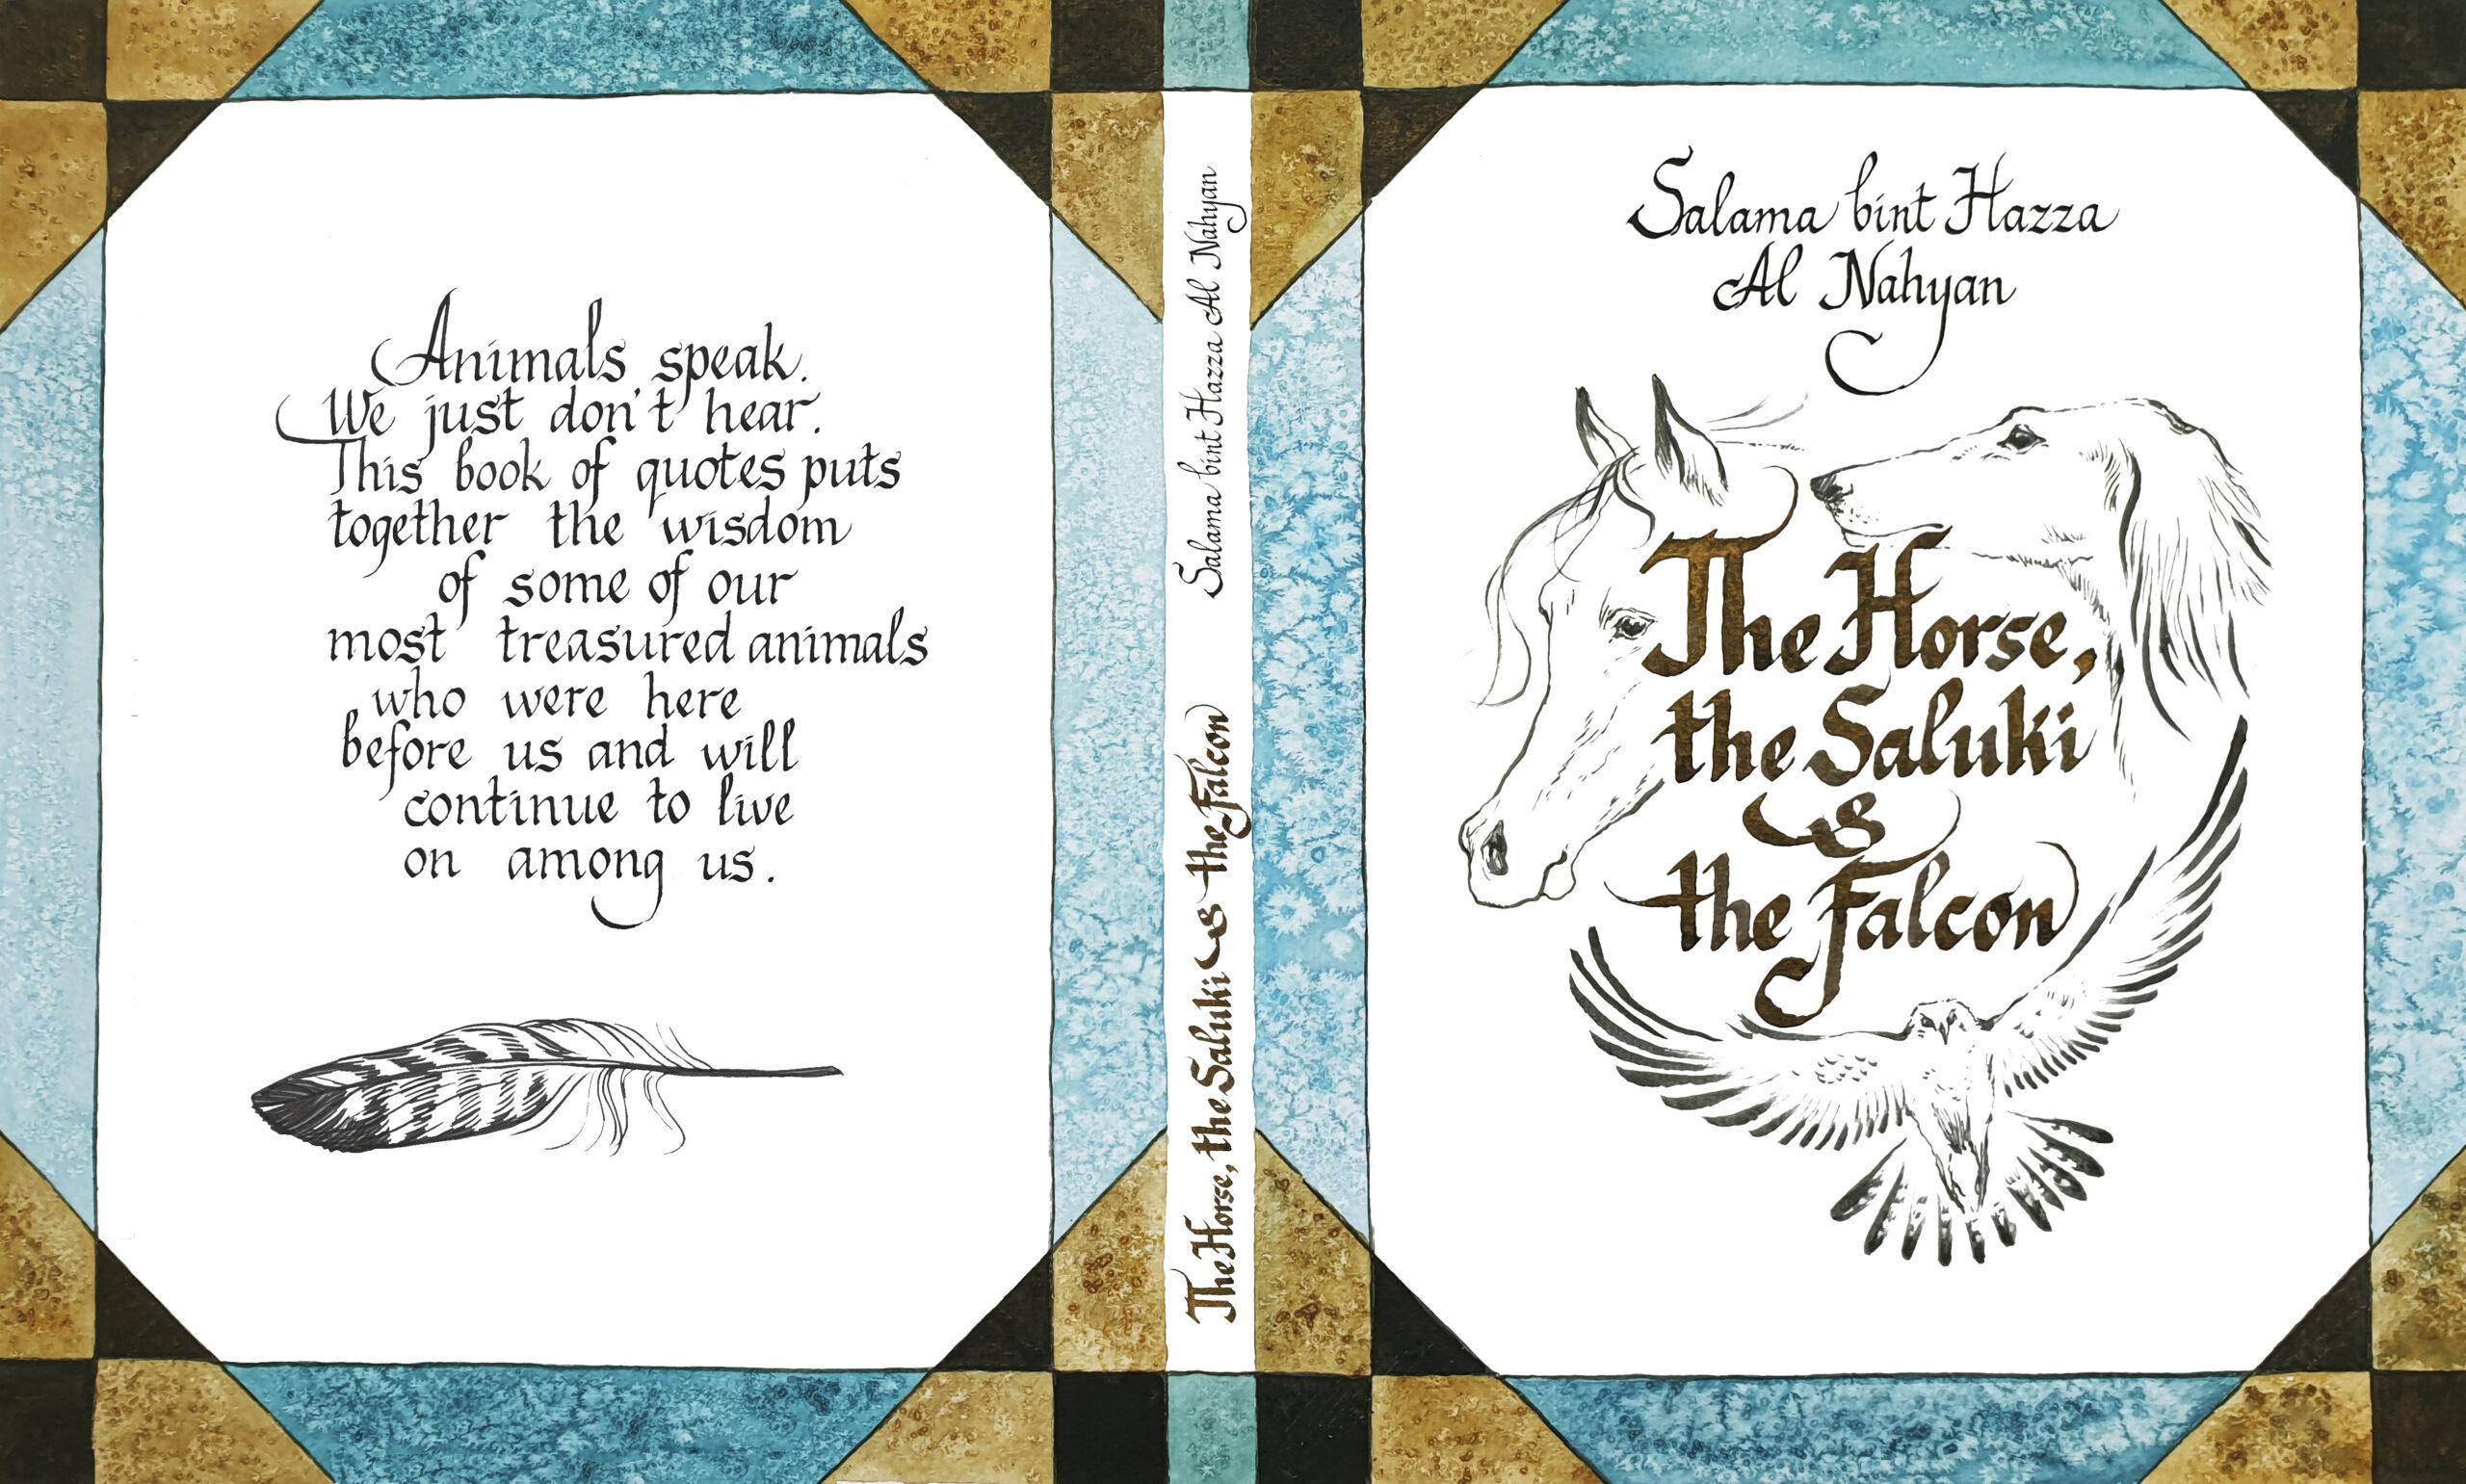 Sheikha Salama Bint Hazza Al Nahyan Pens The Horse, The Saluki & The Falcon